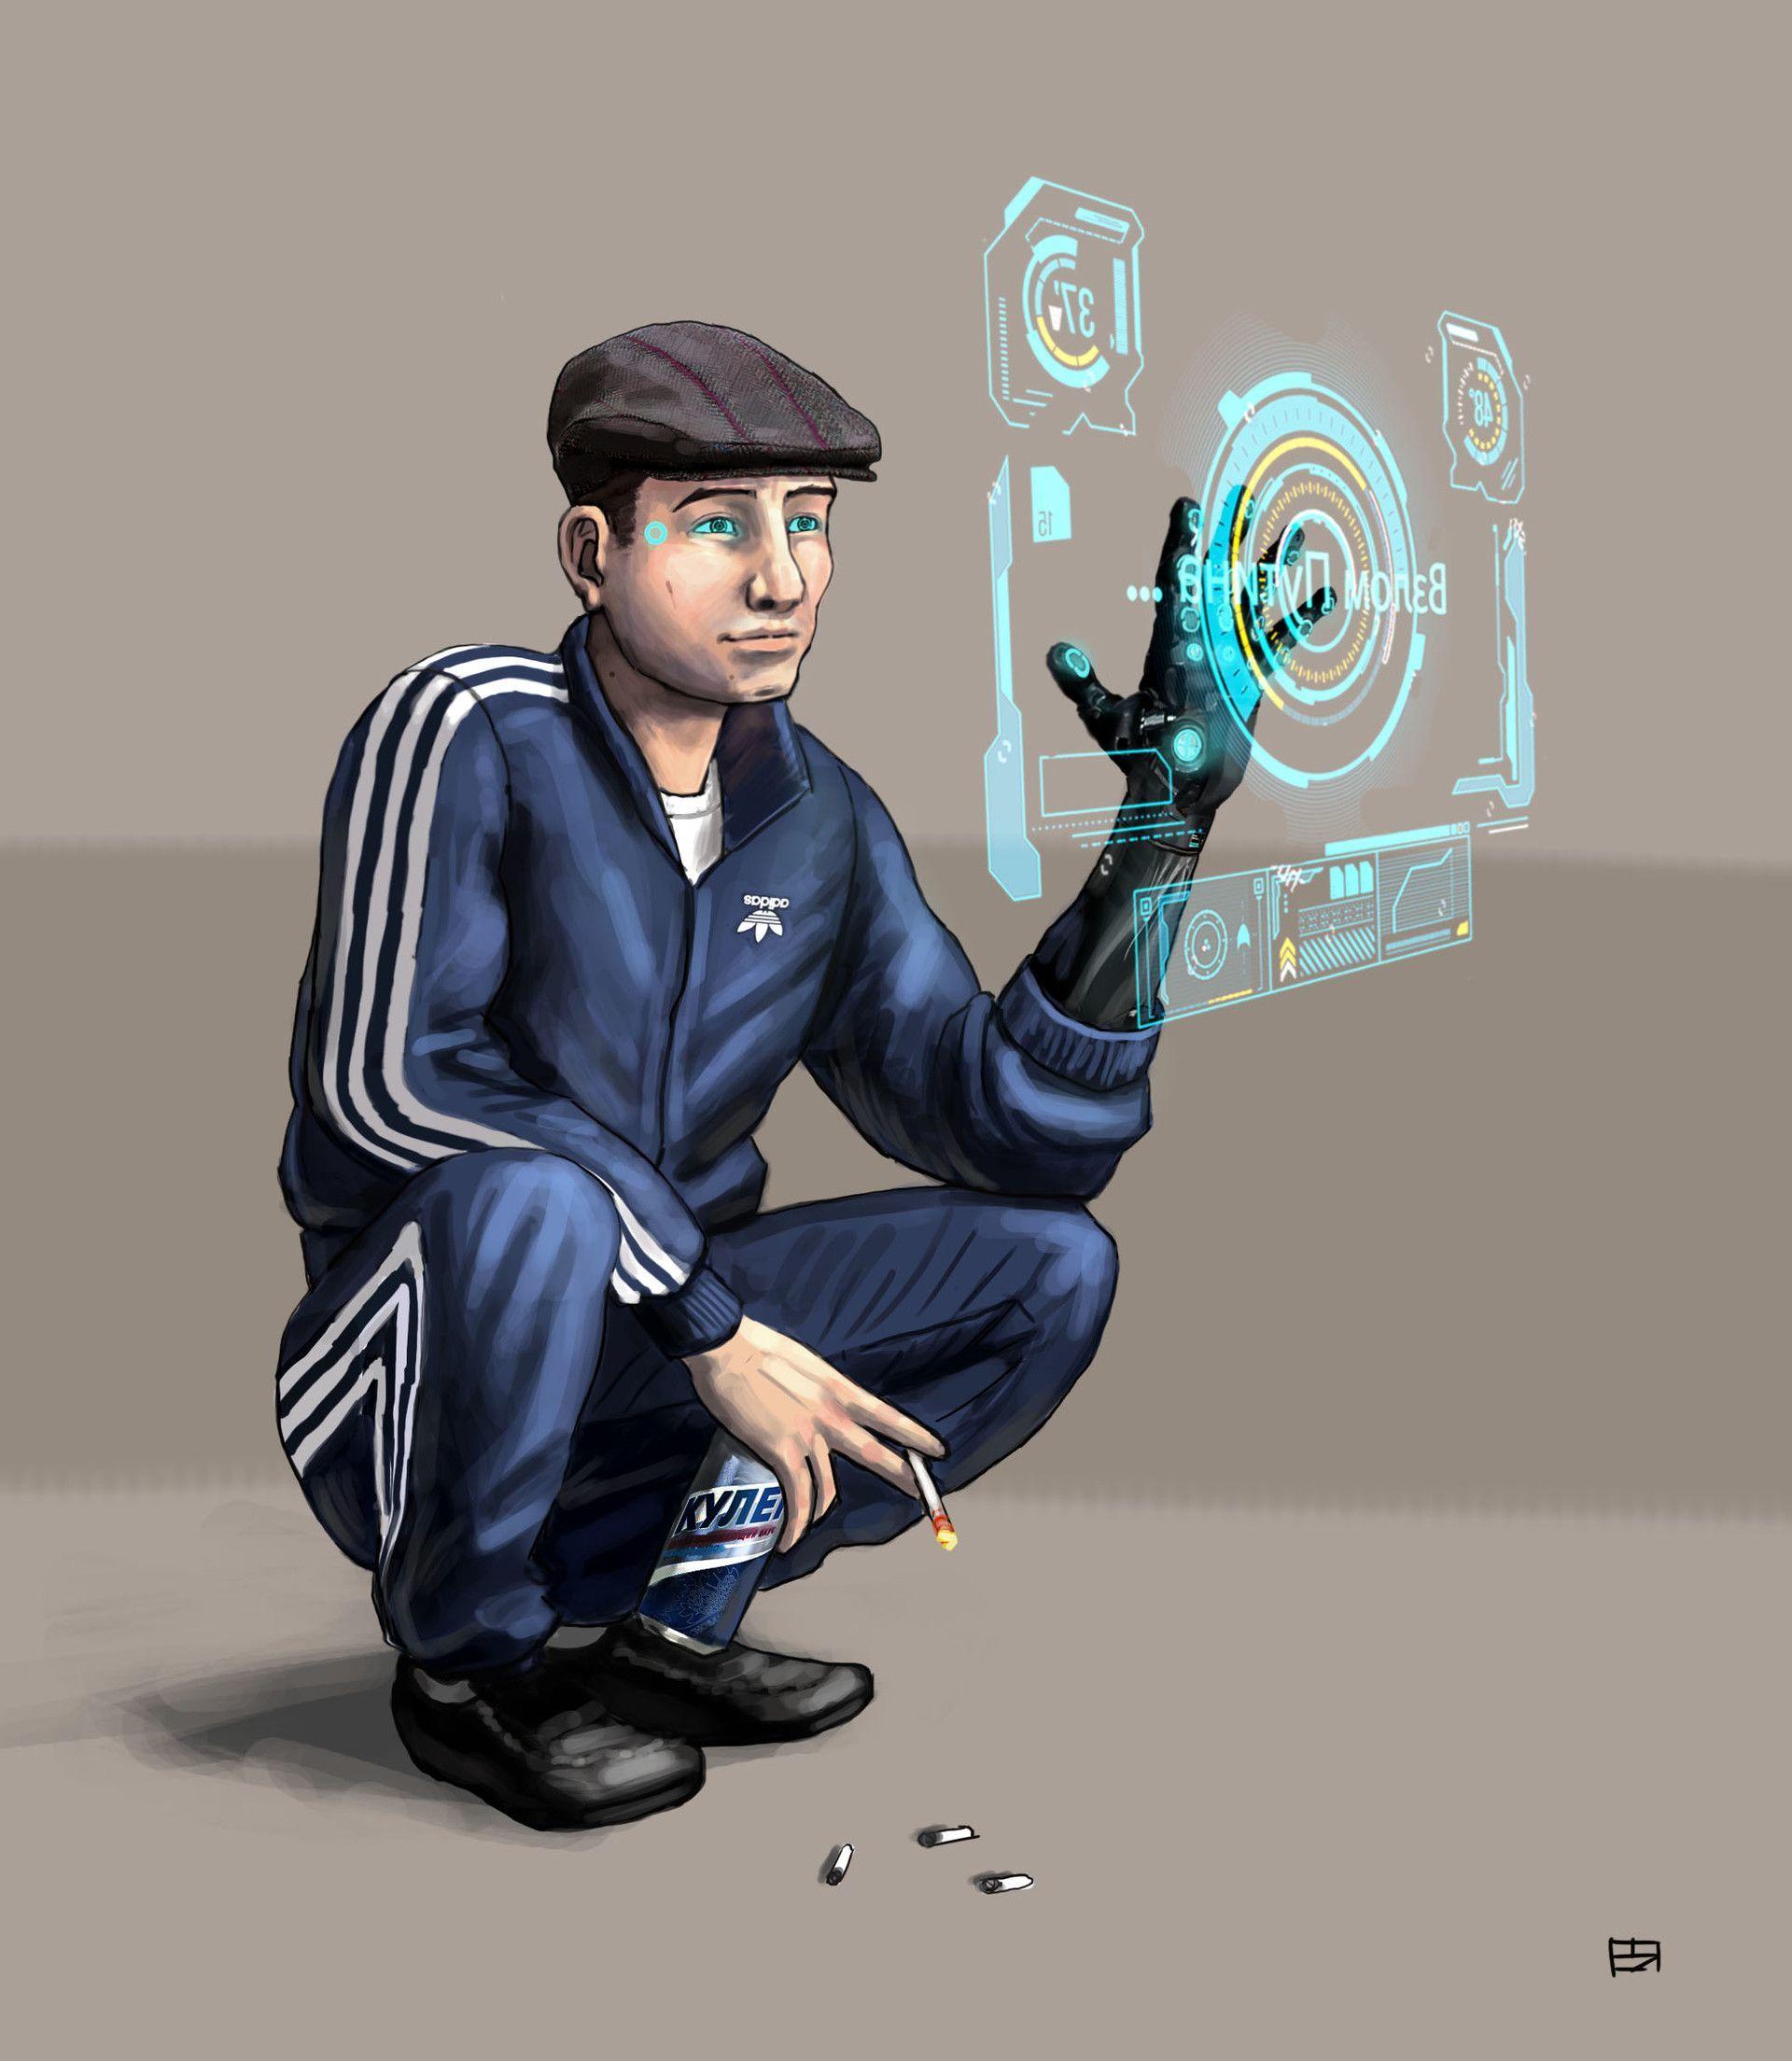 hardbass (With images) Cyberpunk character, Shadowrun